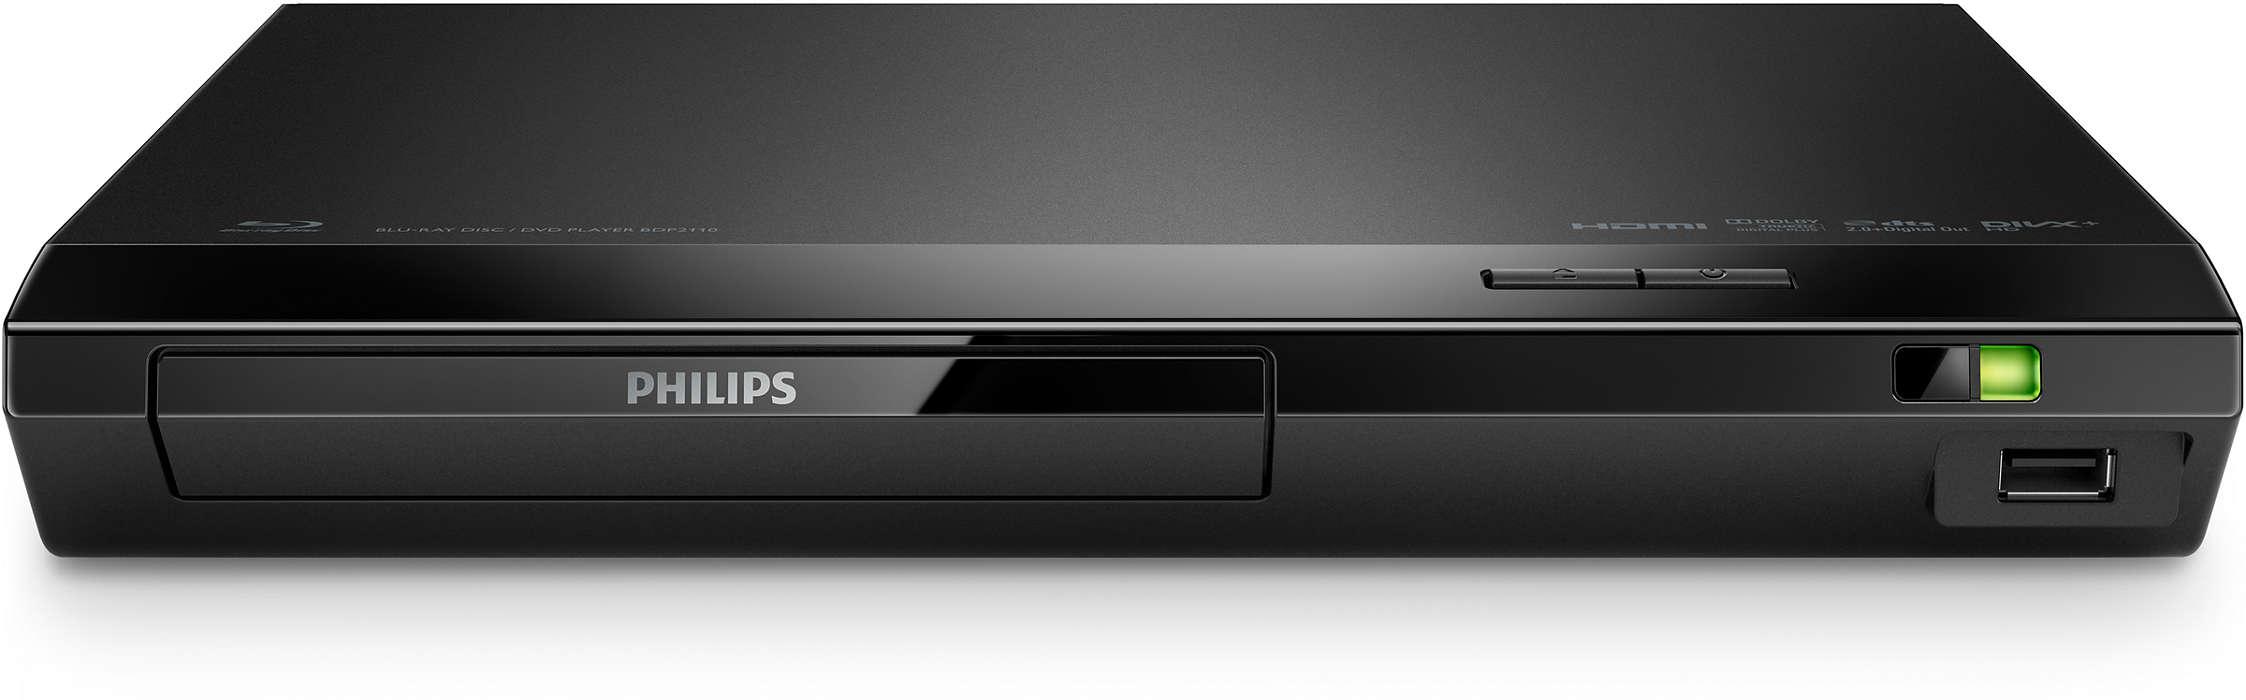 Reproducirajte sve filmove s Blu-ray diskova i DVD medija